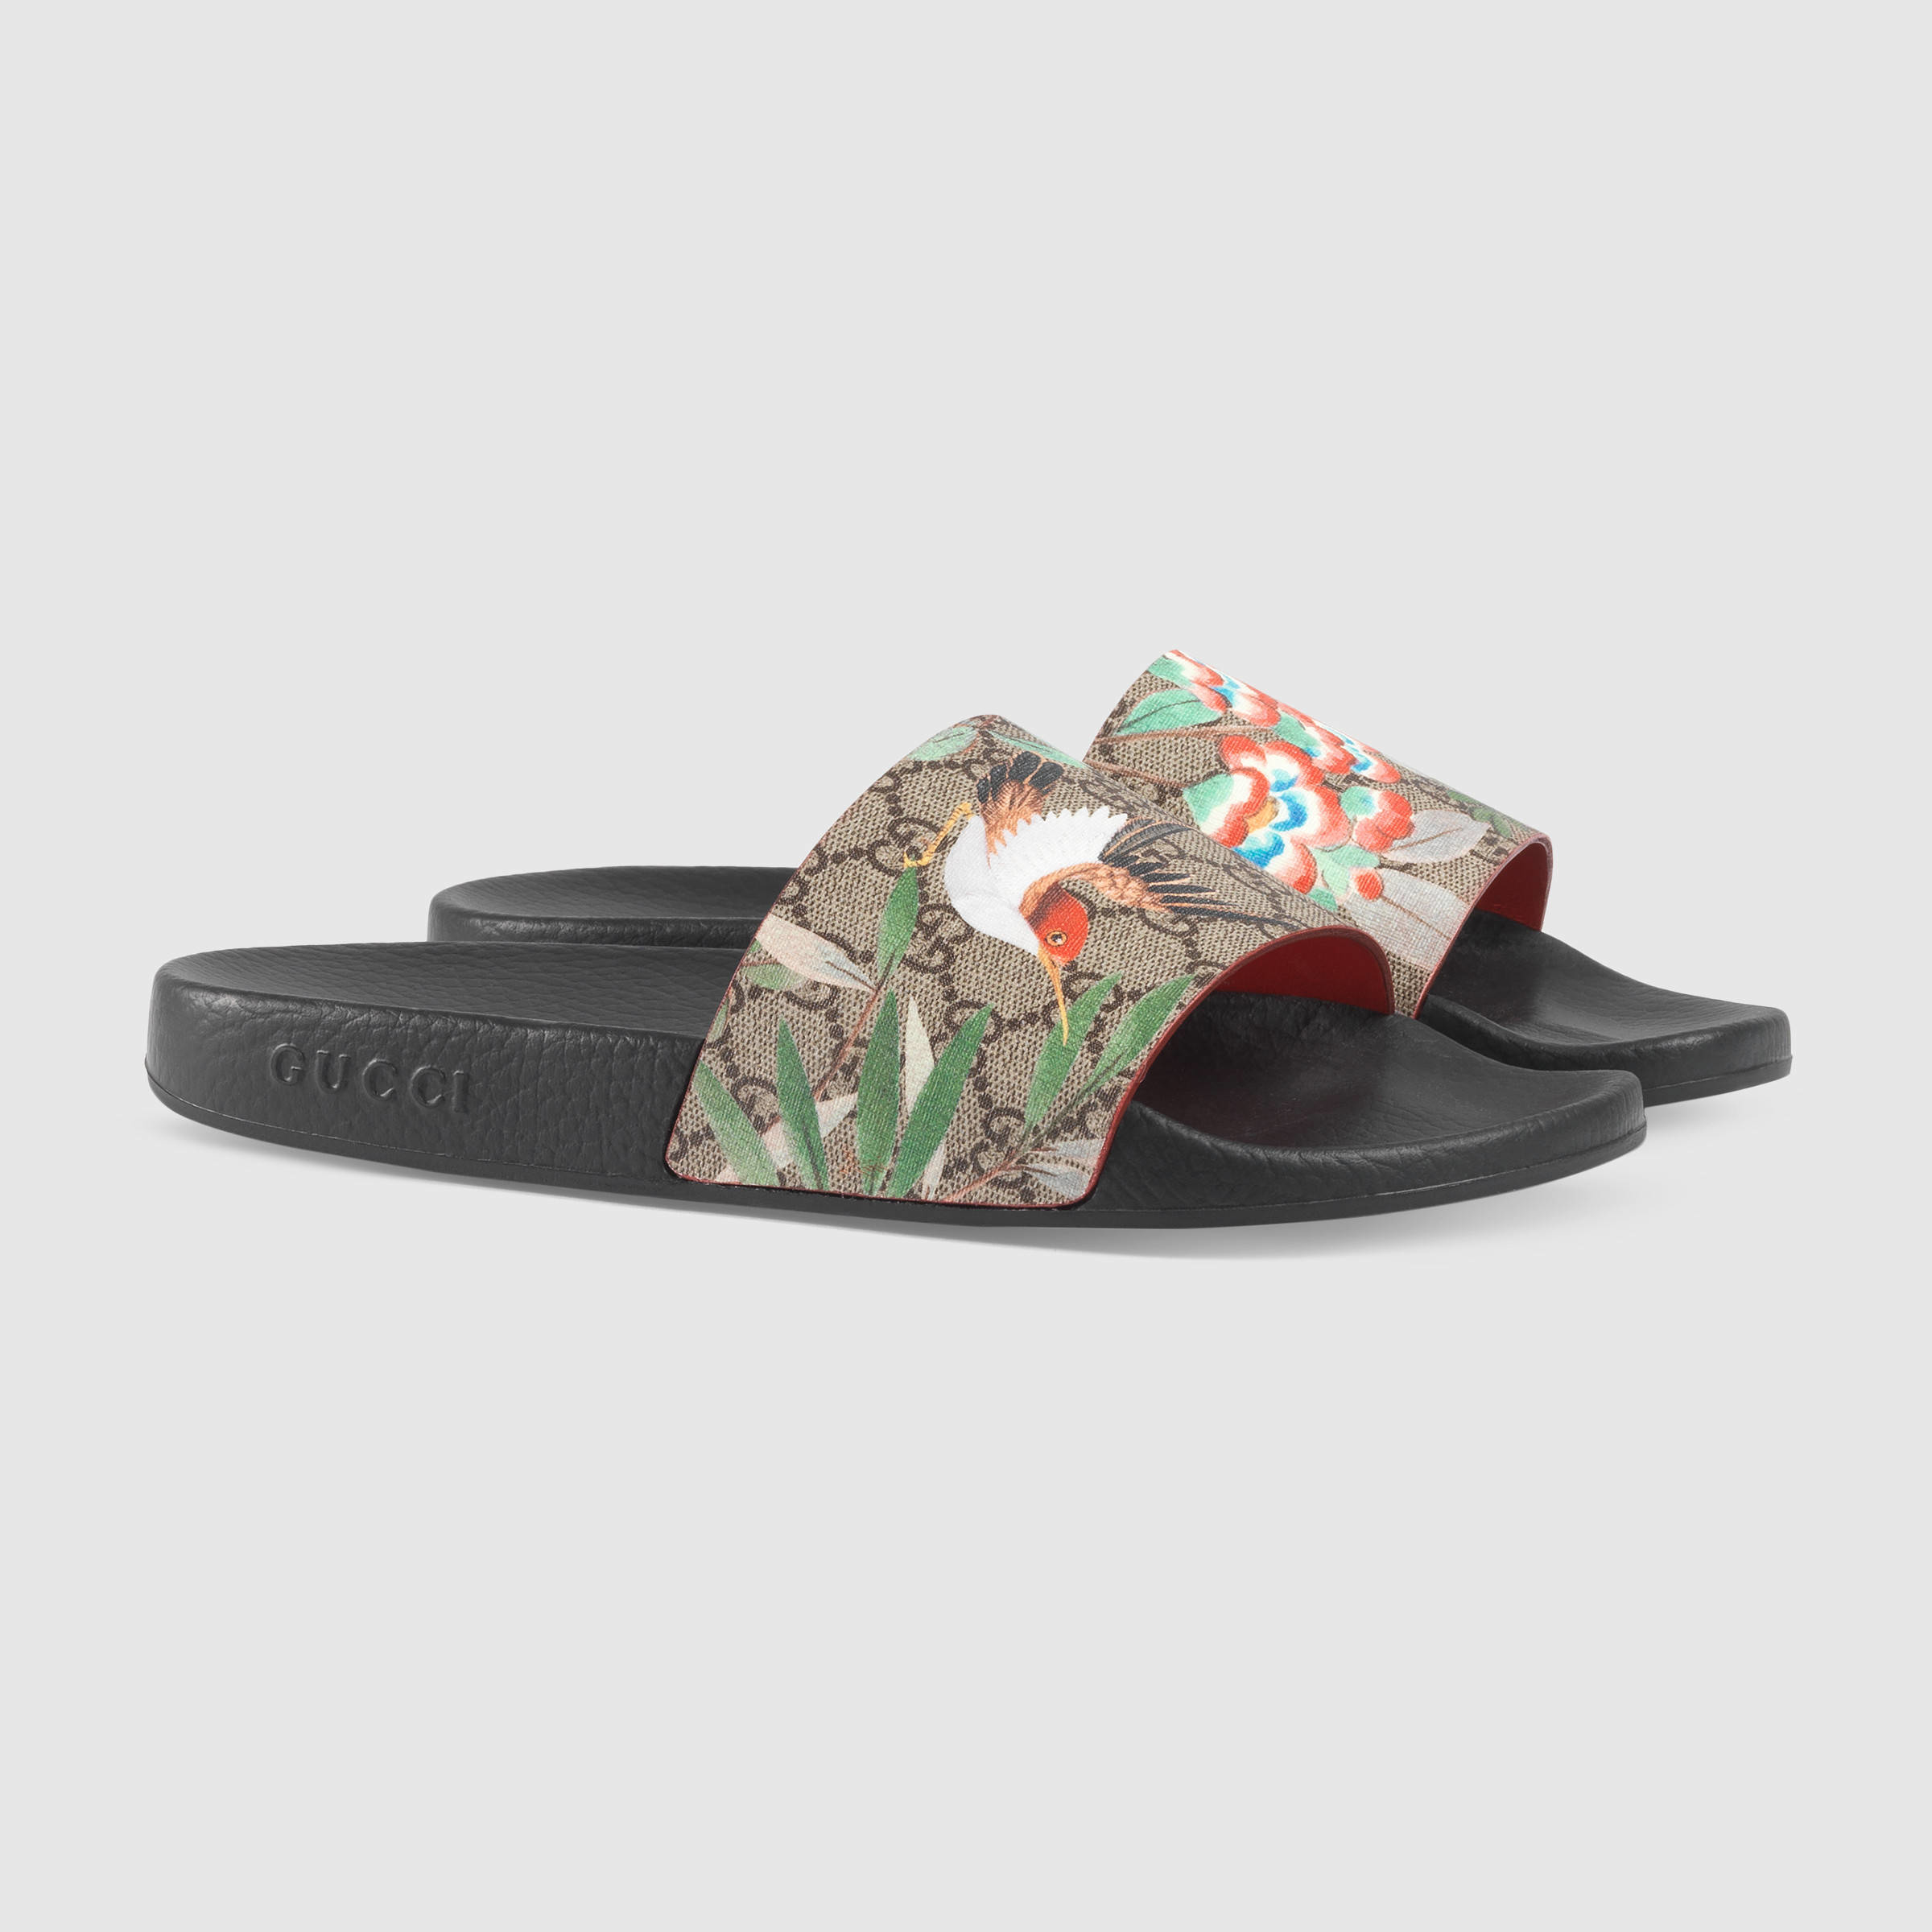 d7dbad0f22e4 Lyst - Gucci Tian Printed Slides for Men